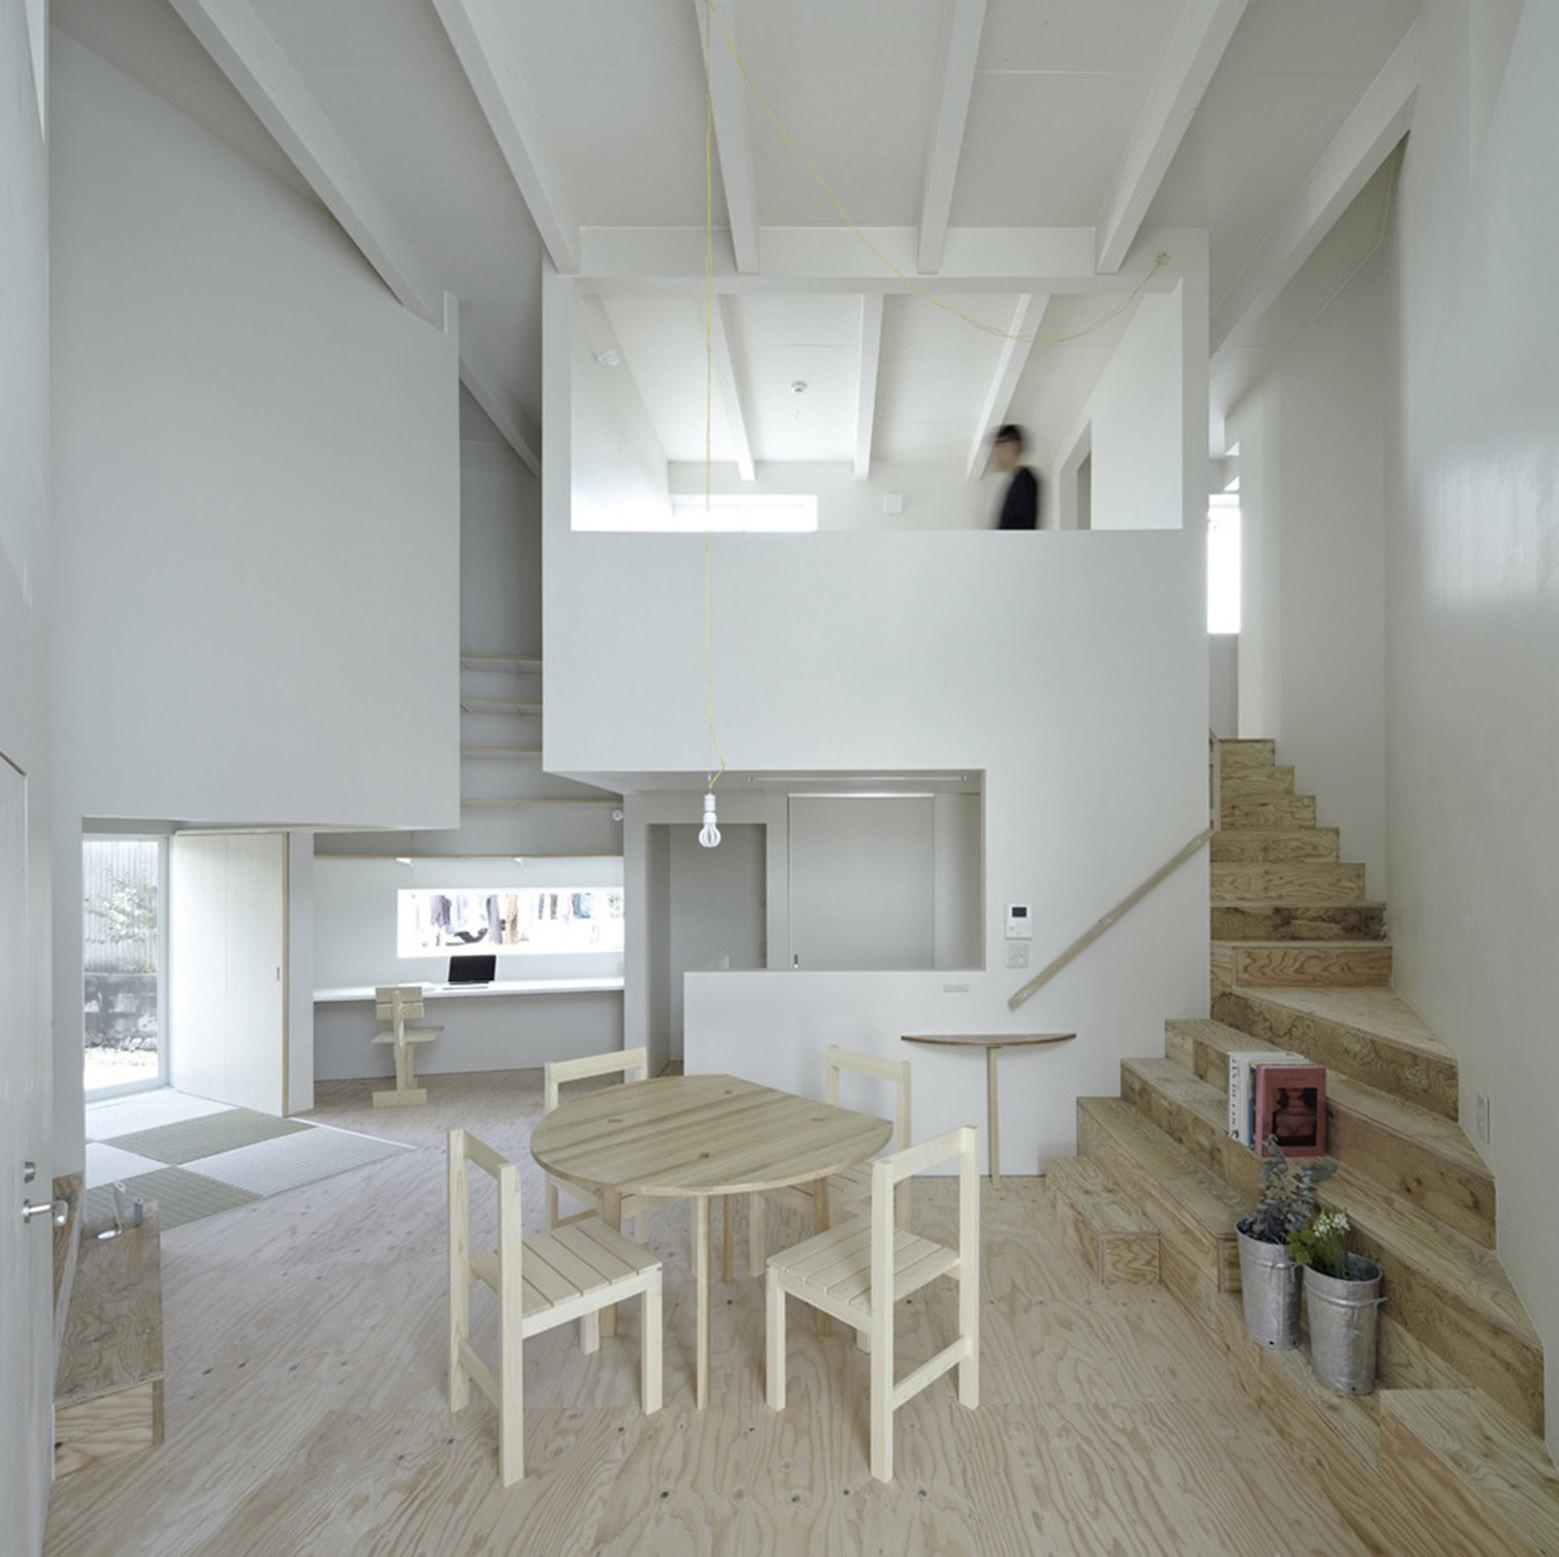 House In Iizuka / Rhythmdesign, © Koichi Torimura